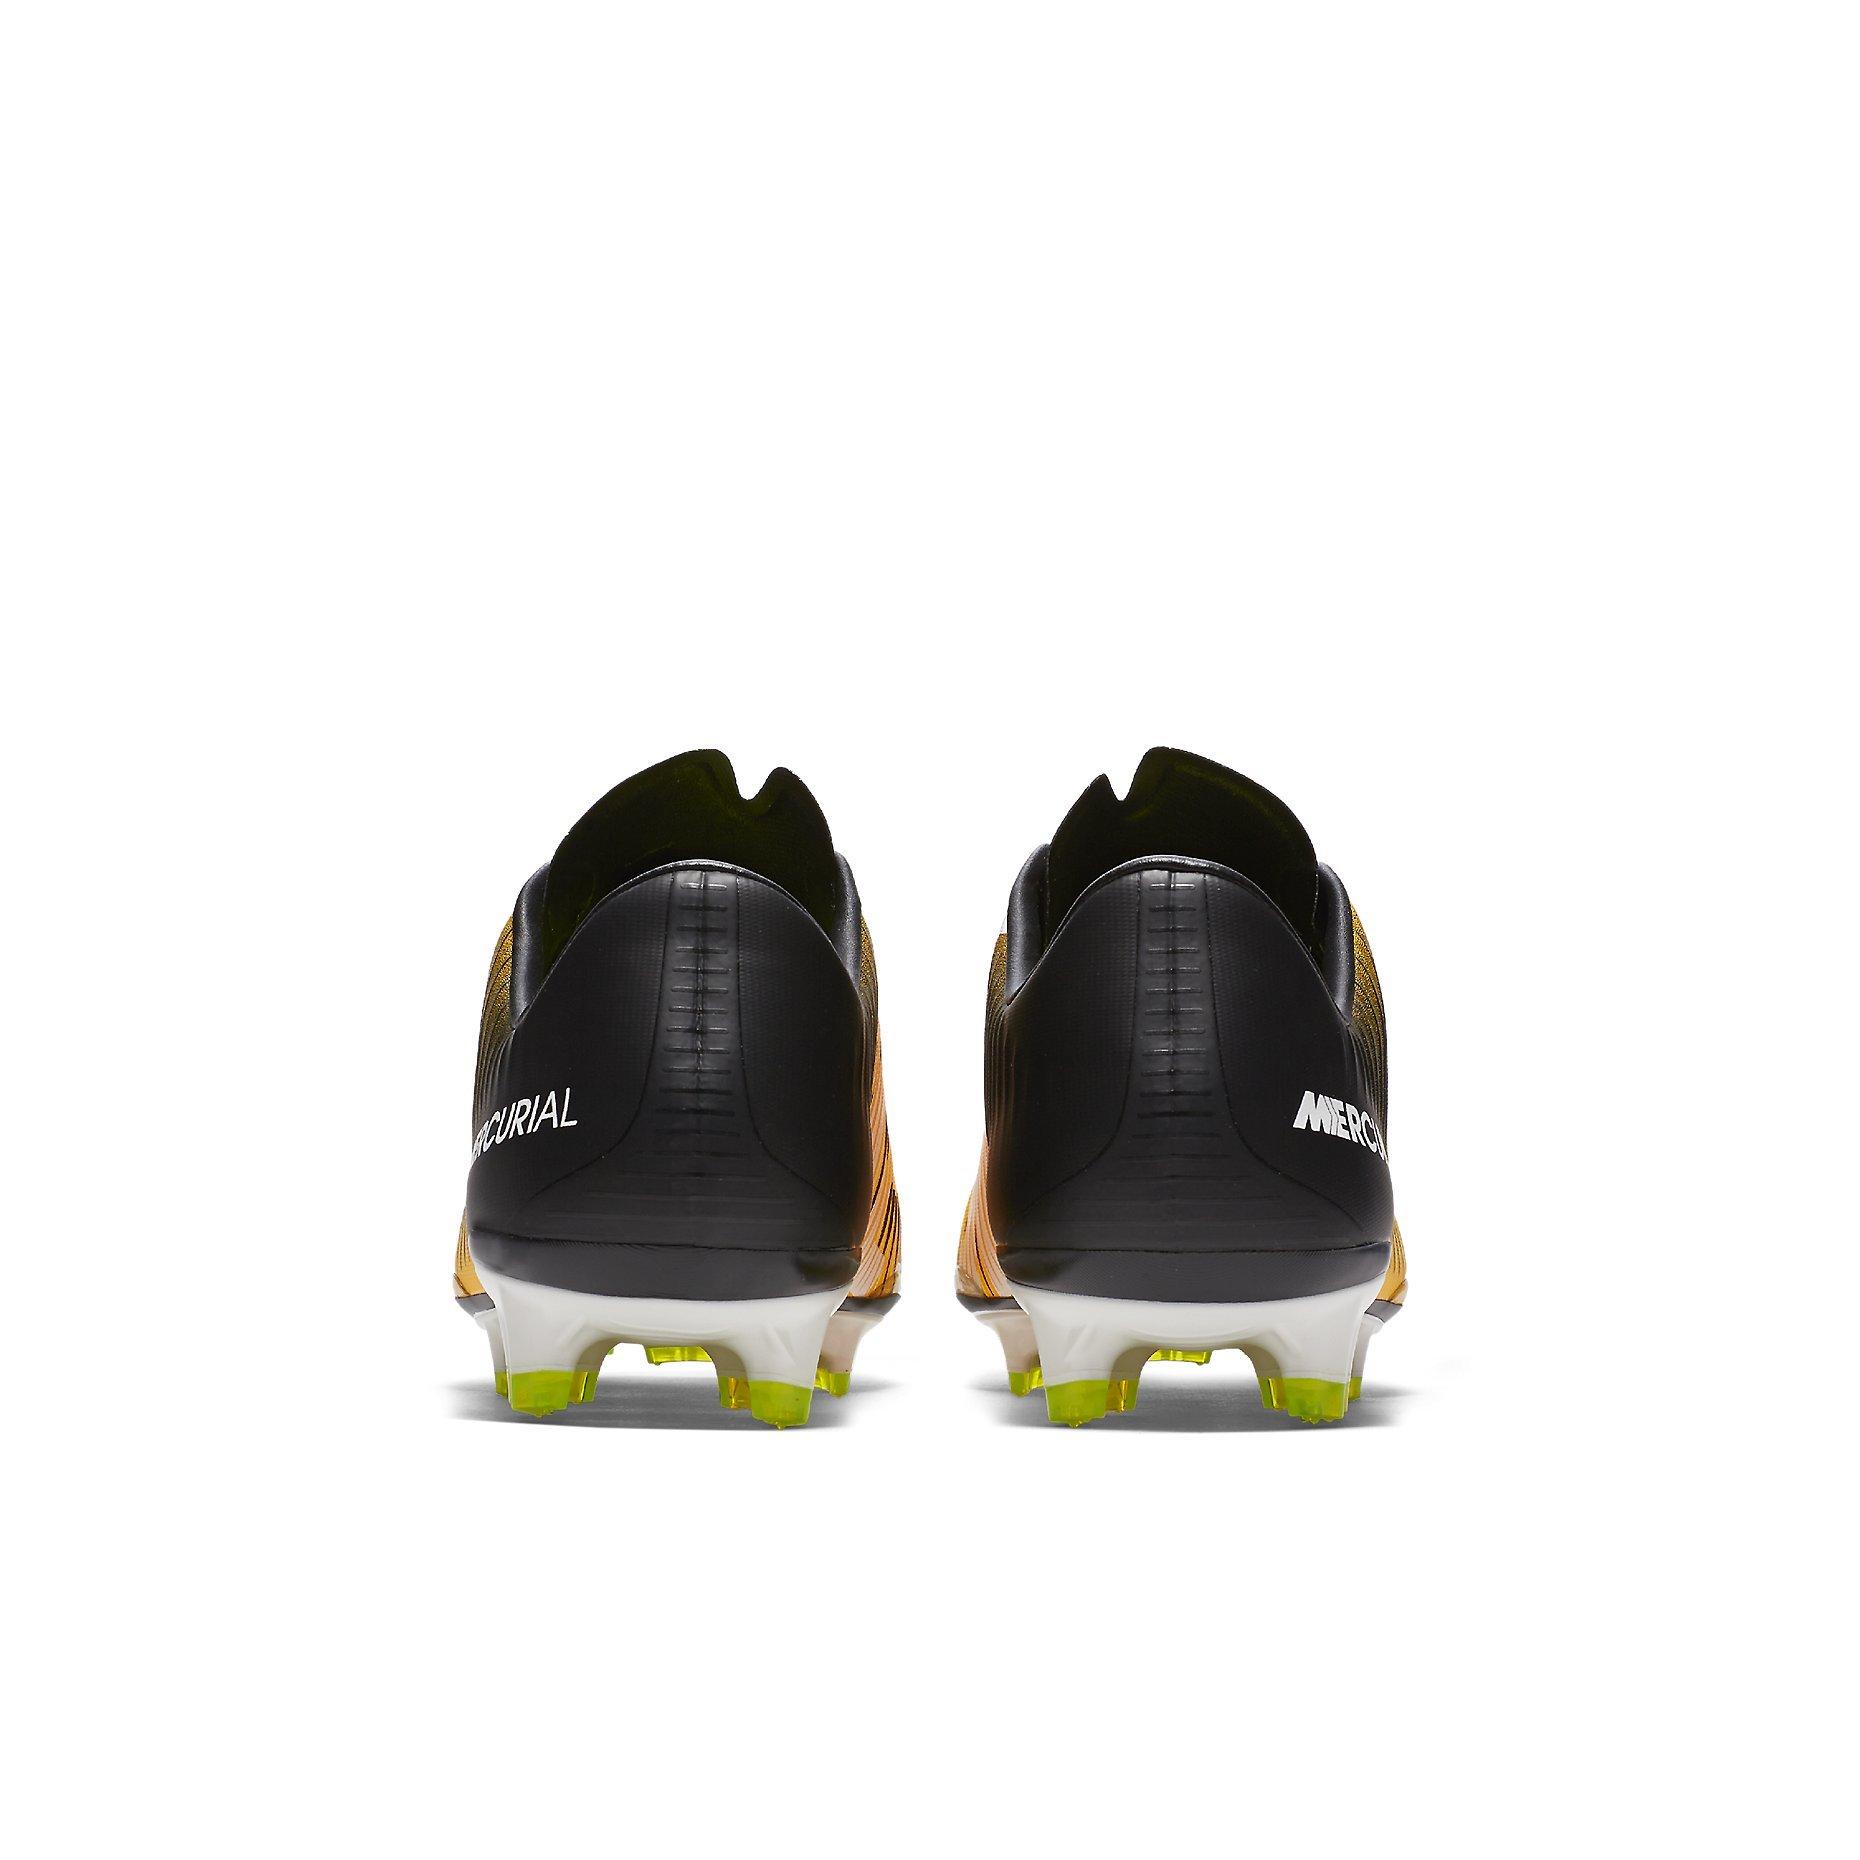 Football shoes Nike MERCURIAL VAPOR XI FG